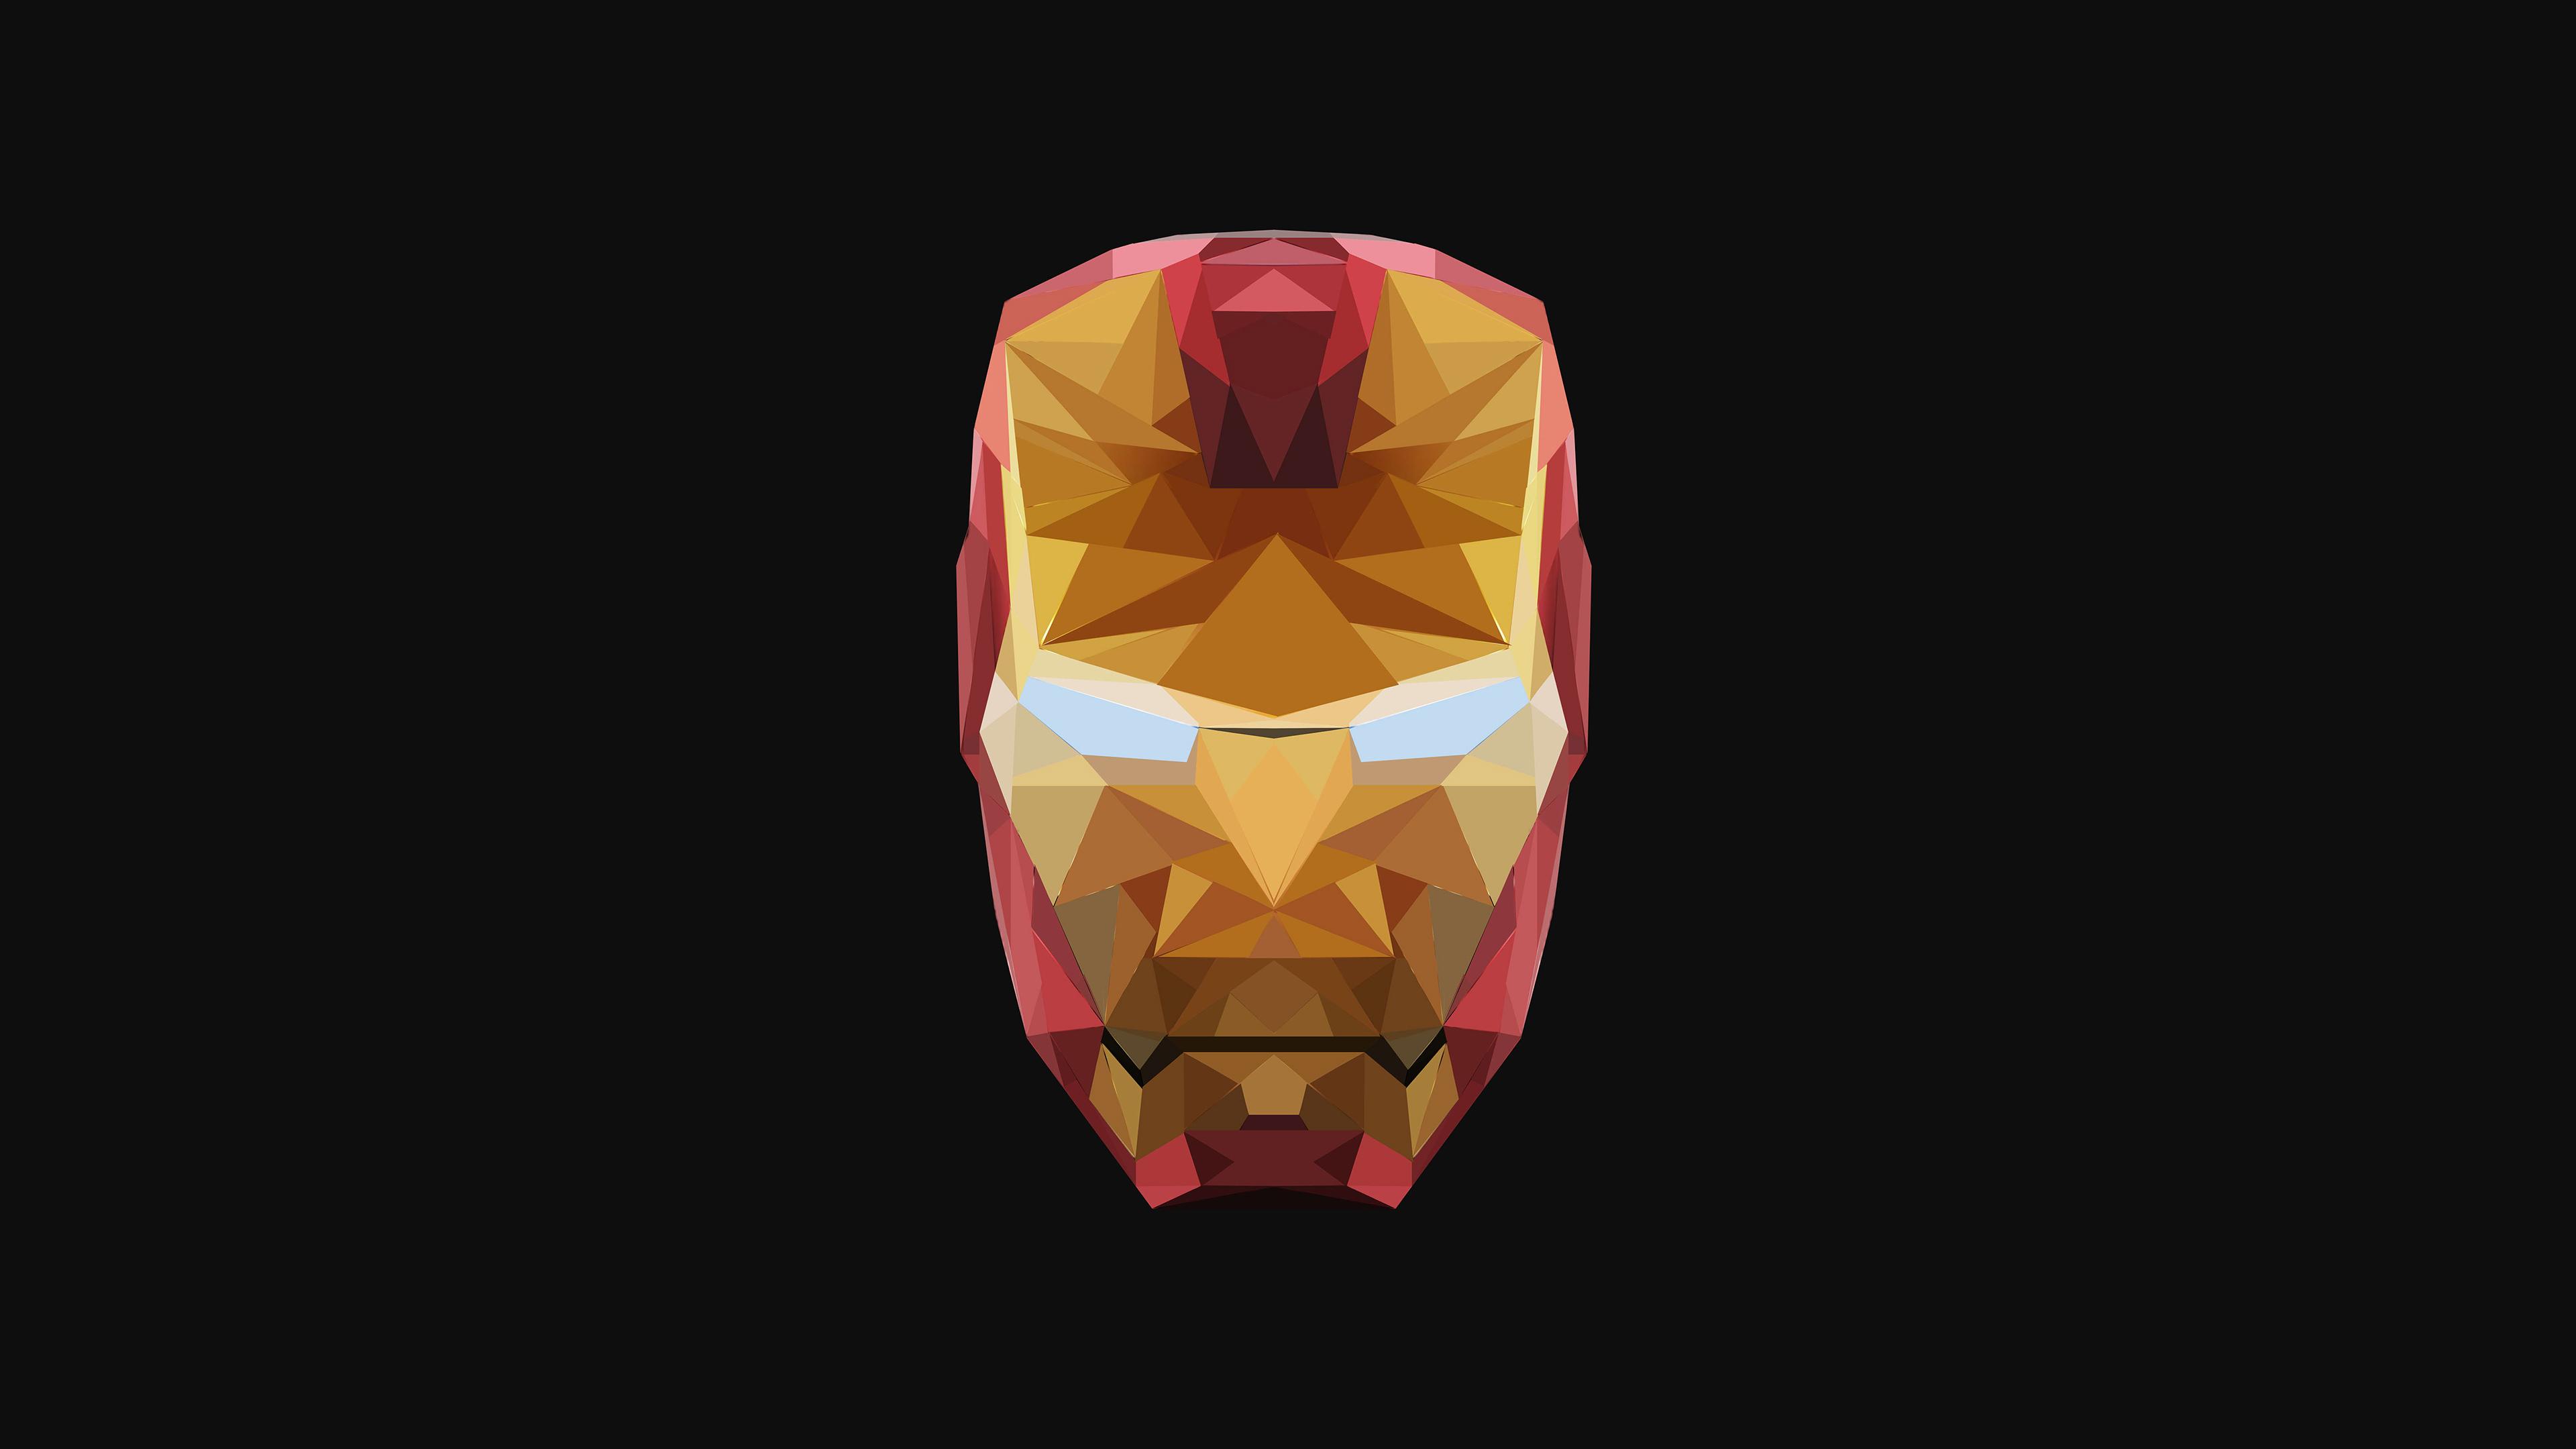 Wallpaper 4k 4k Iron Man Low Poly 4k Wallpapers Behance